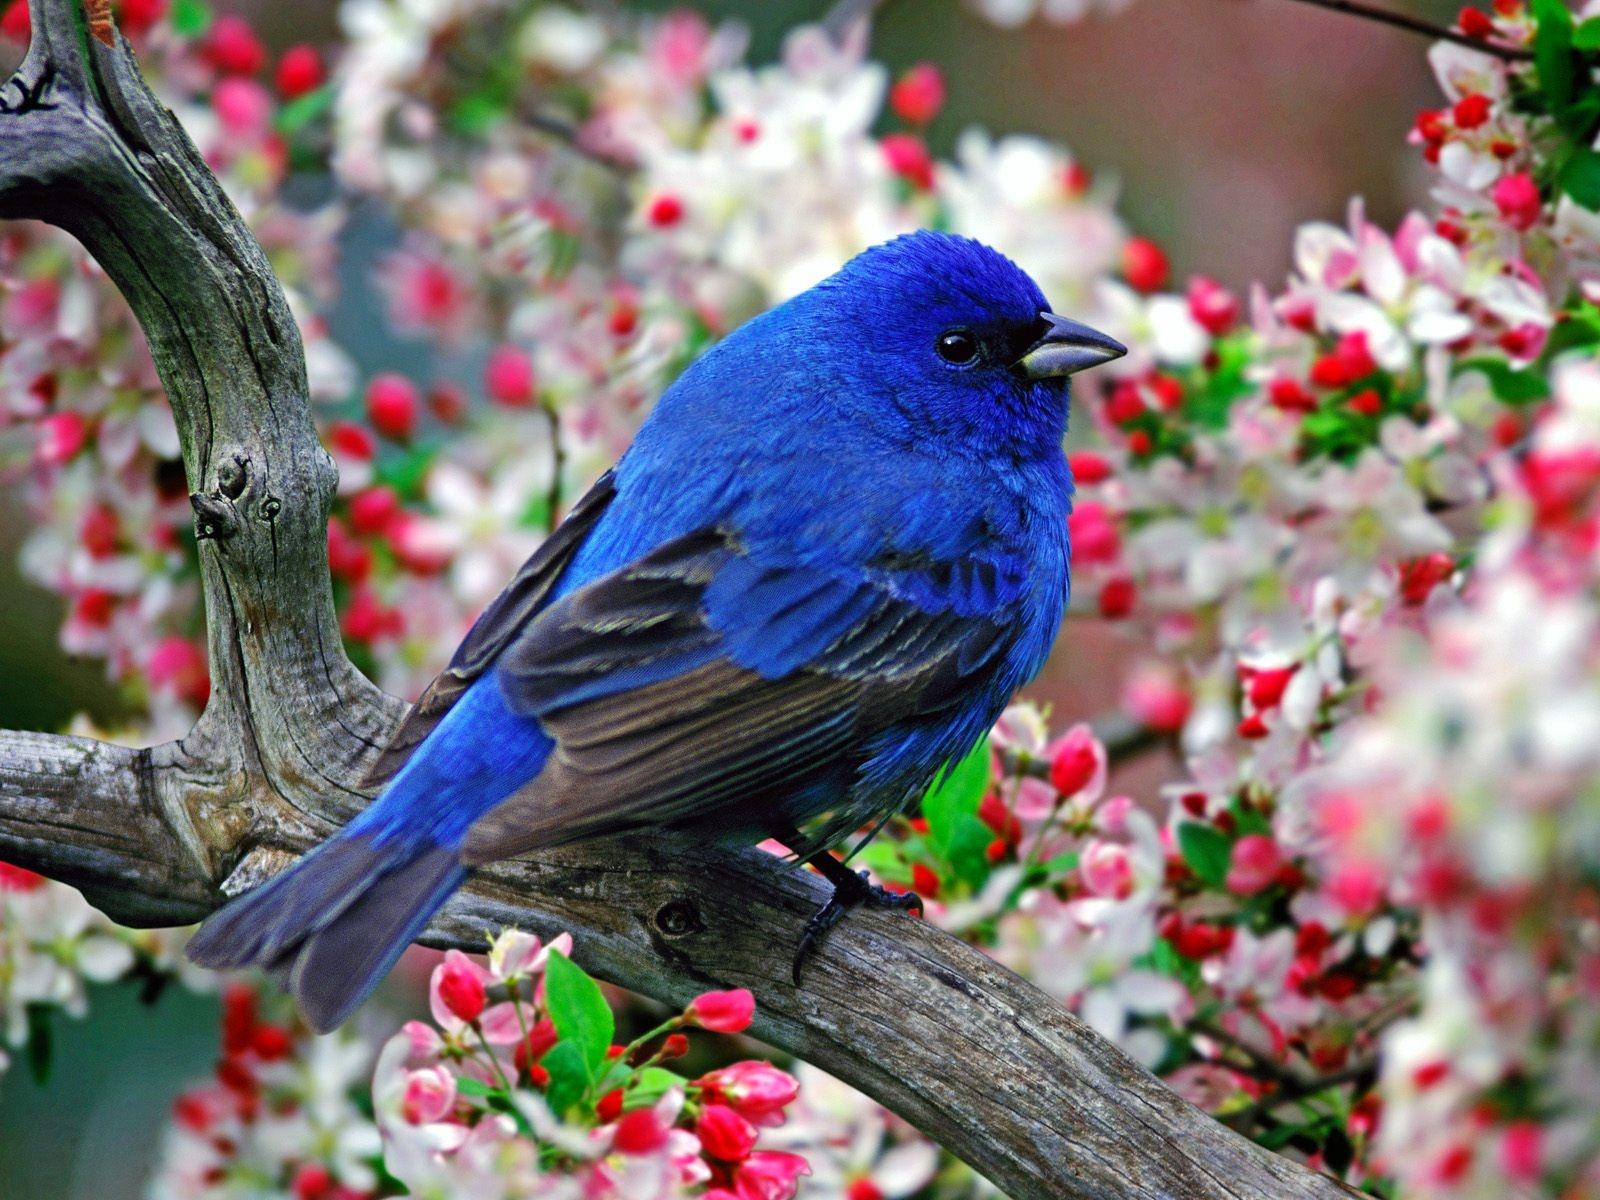 Amazing Wild Life Birds Wallpaper Hd Angelic Hugs